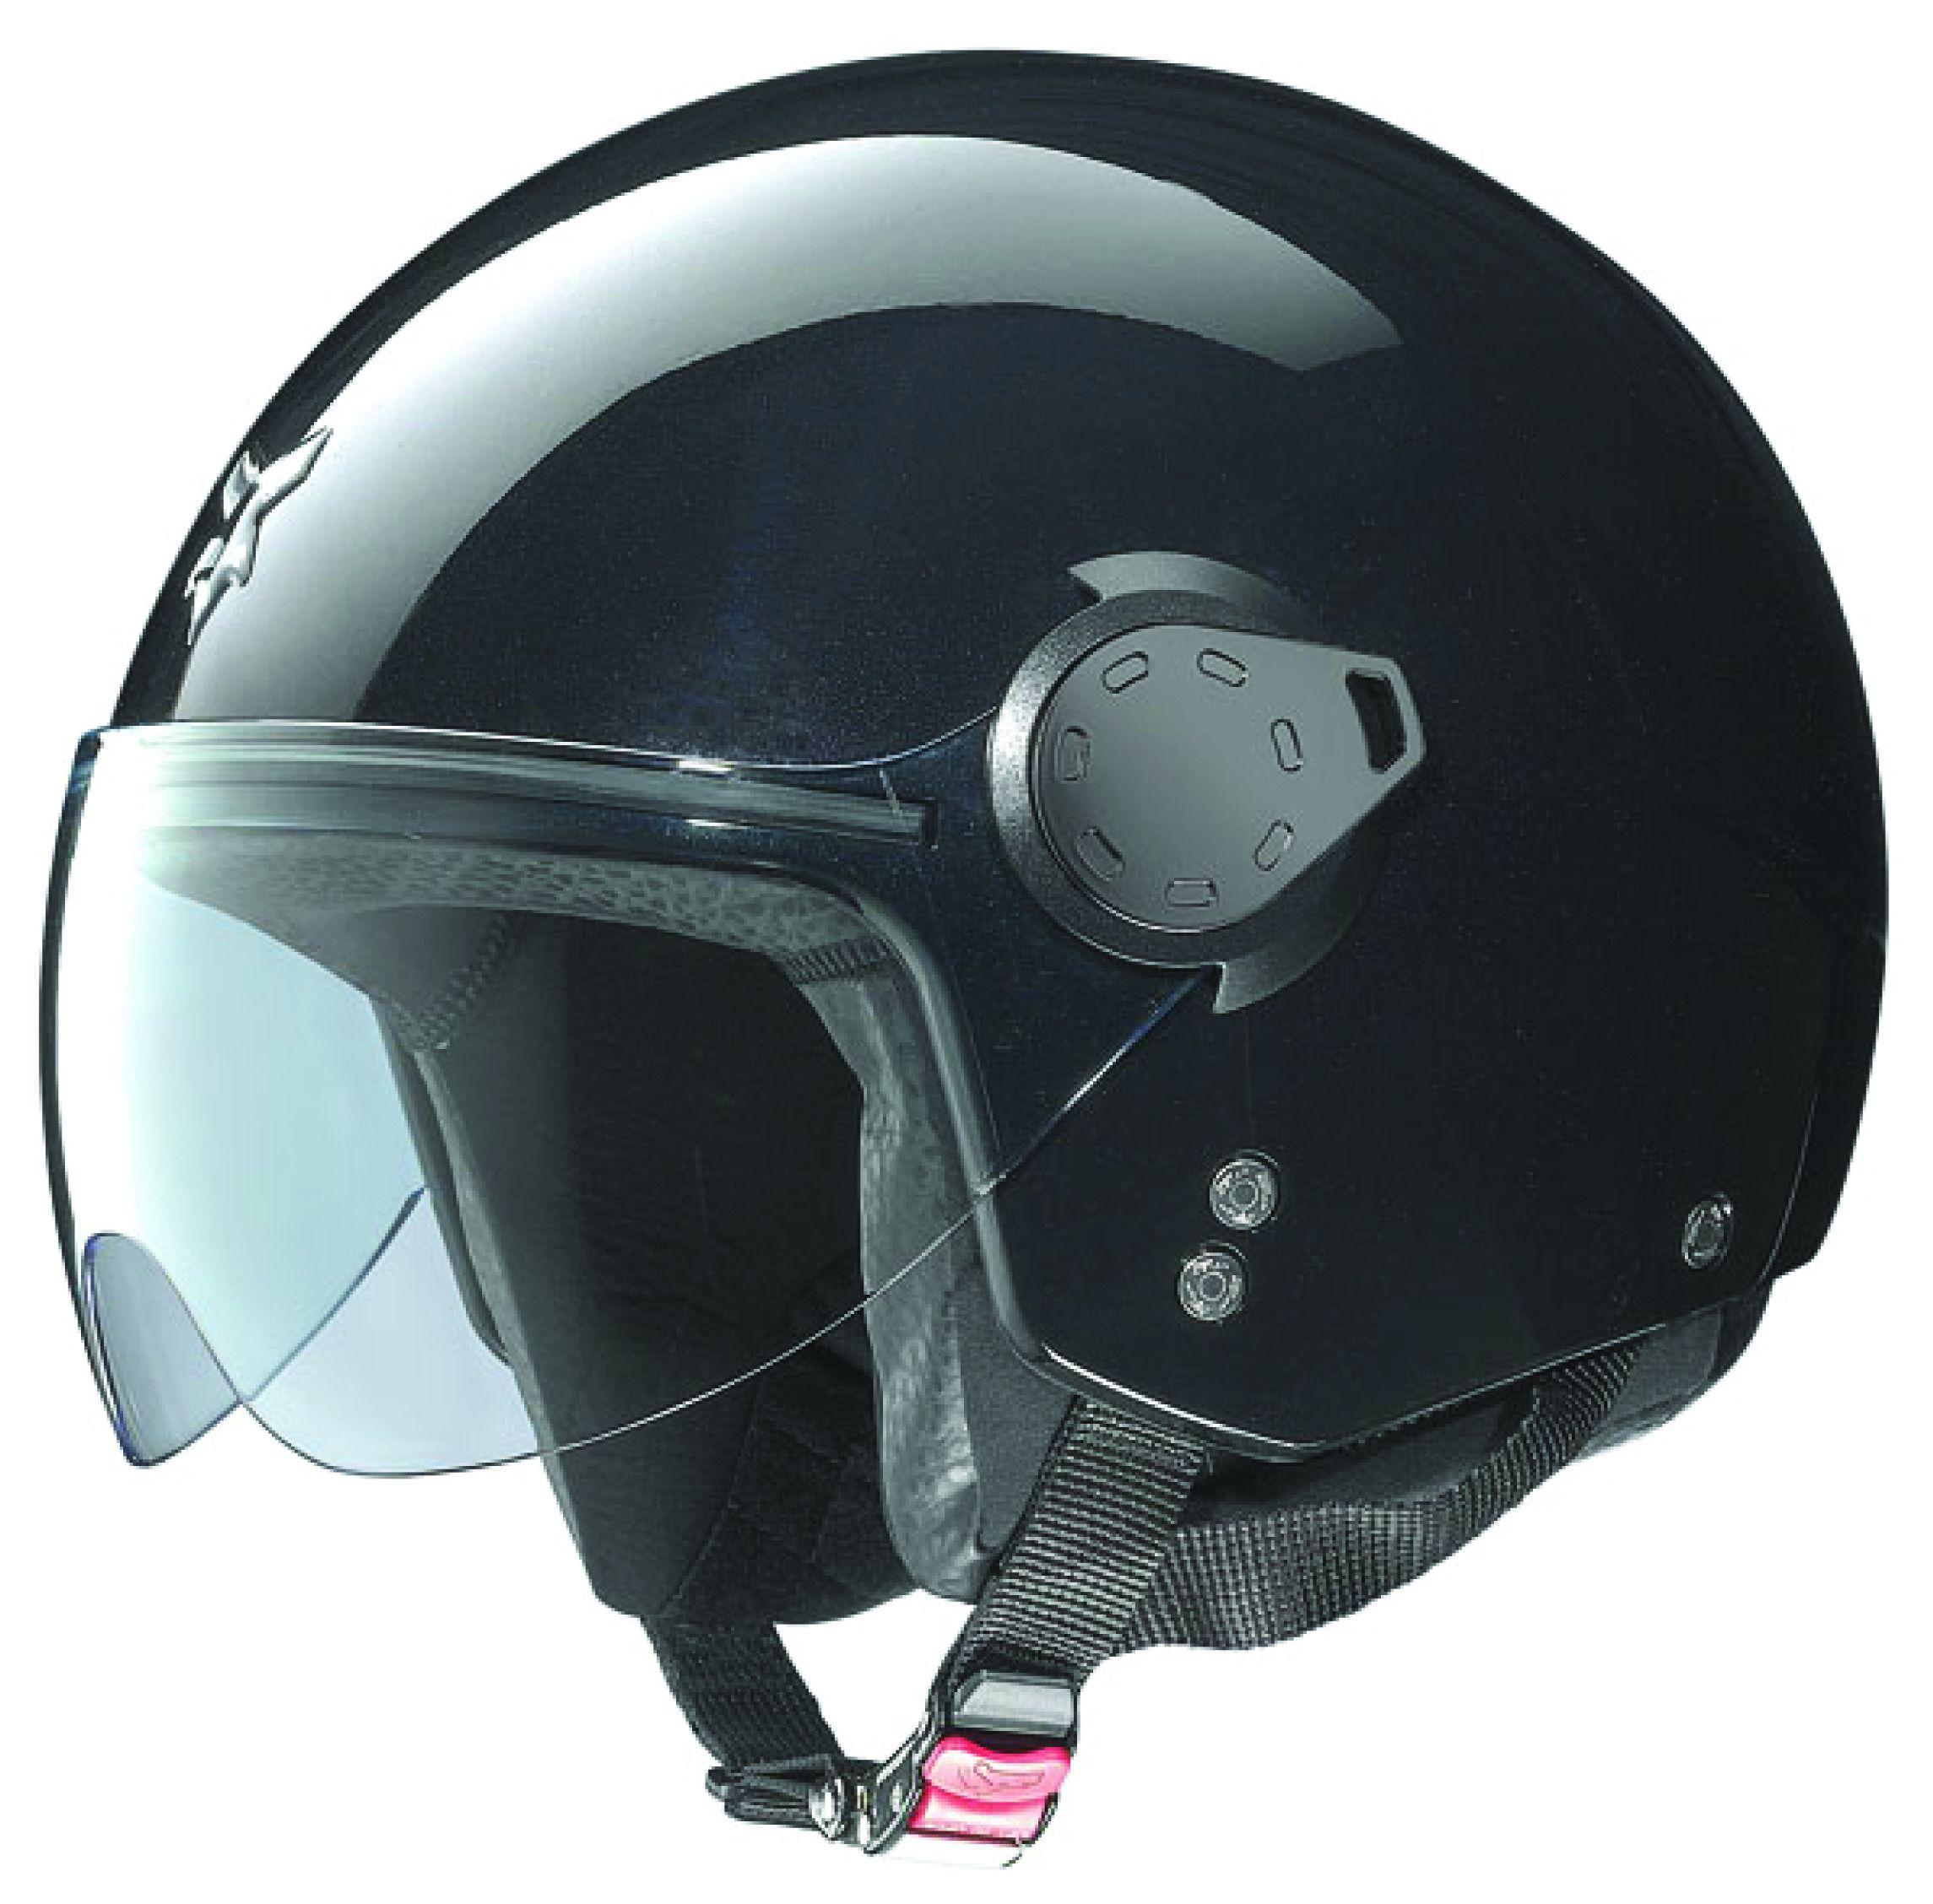 Nolan N20 Outlaw Helmet (Size SM Only) - RevZilla